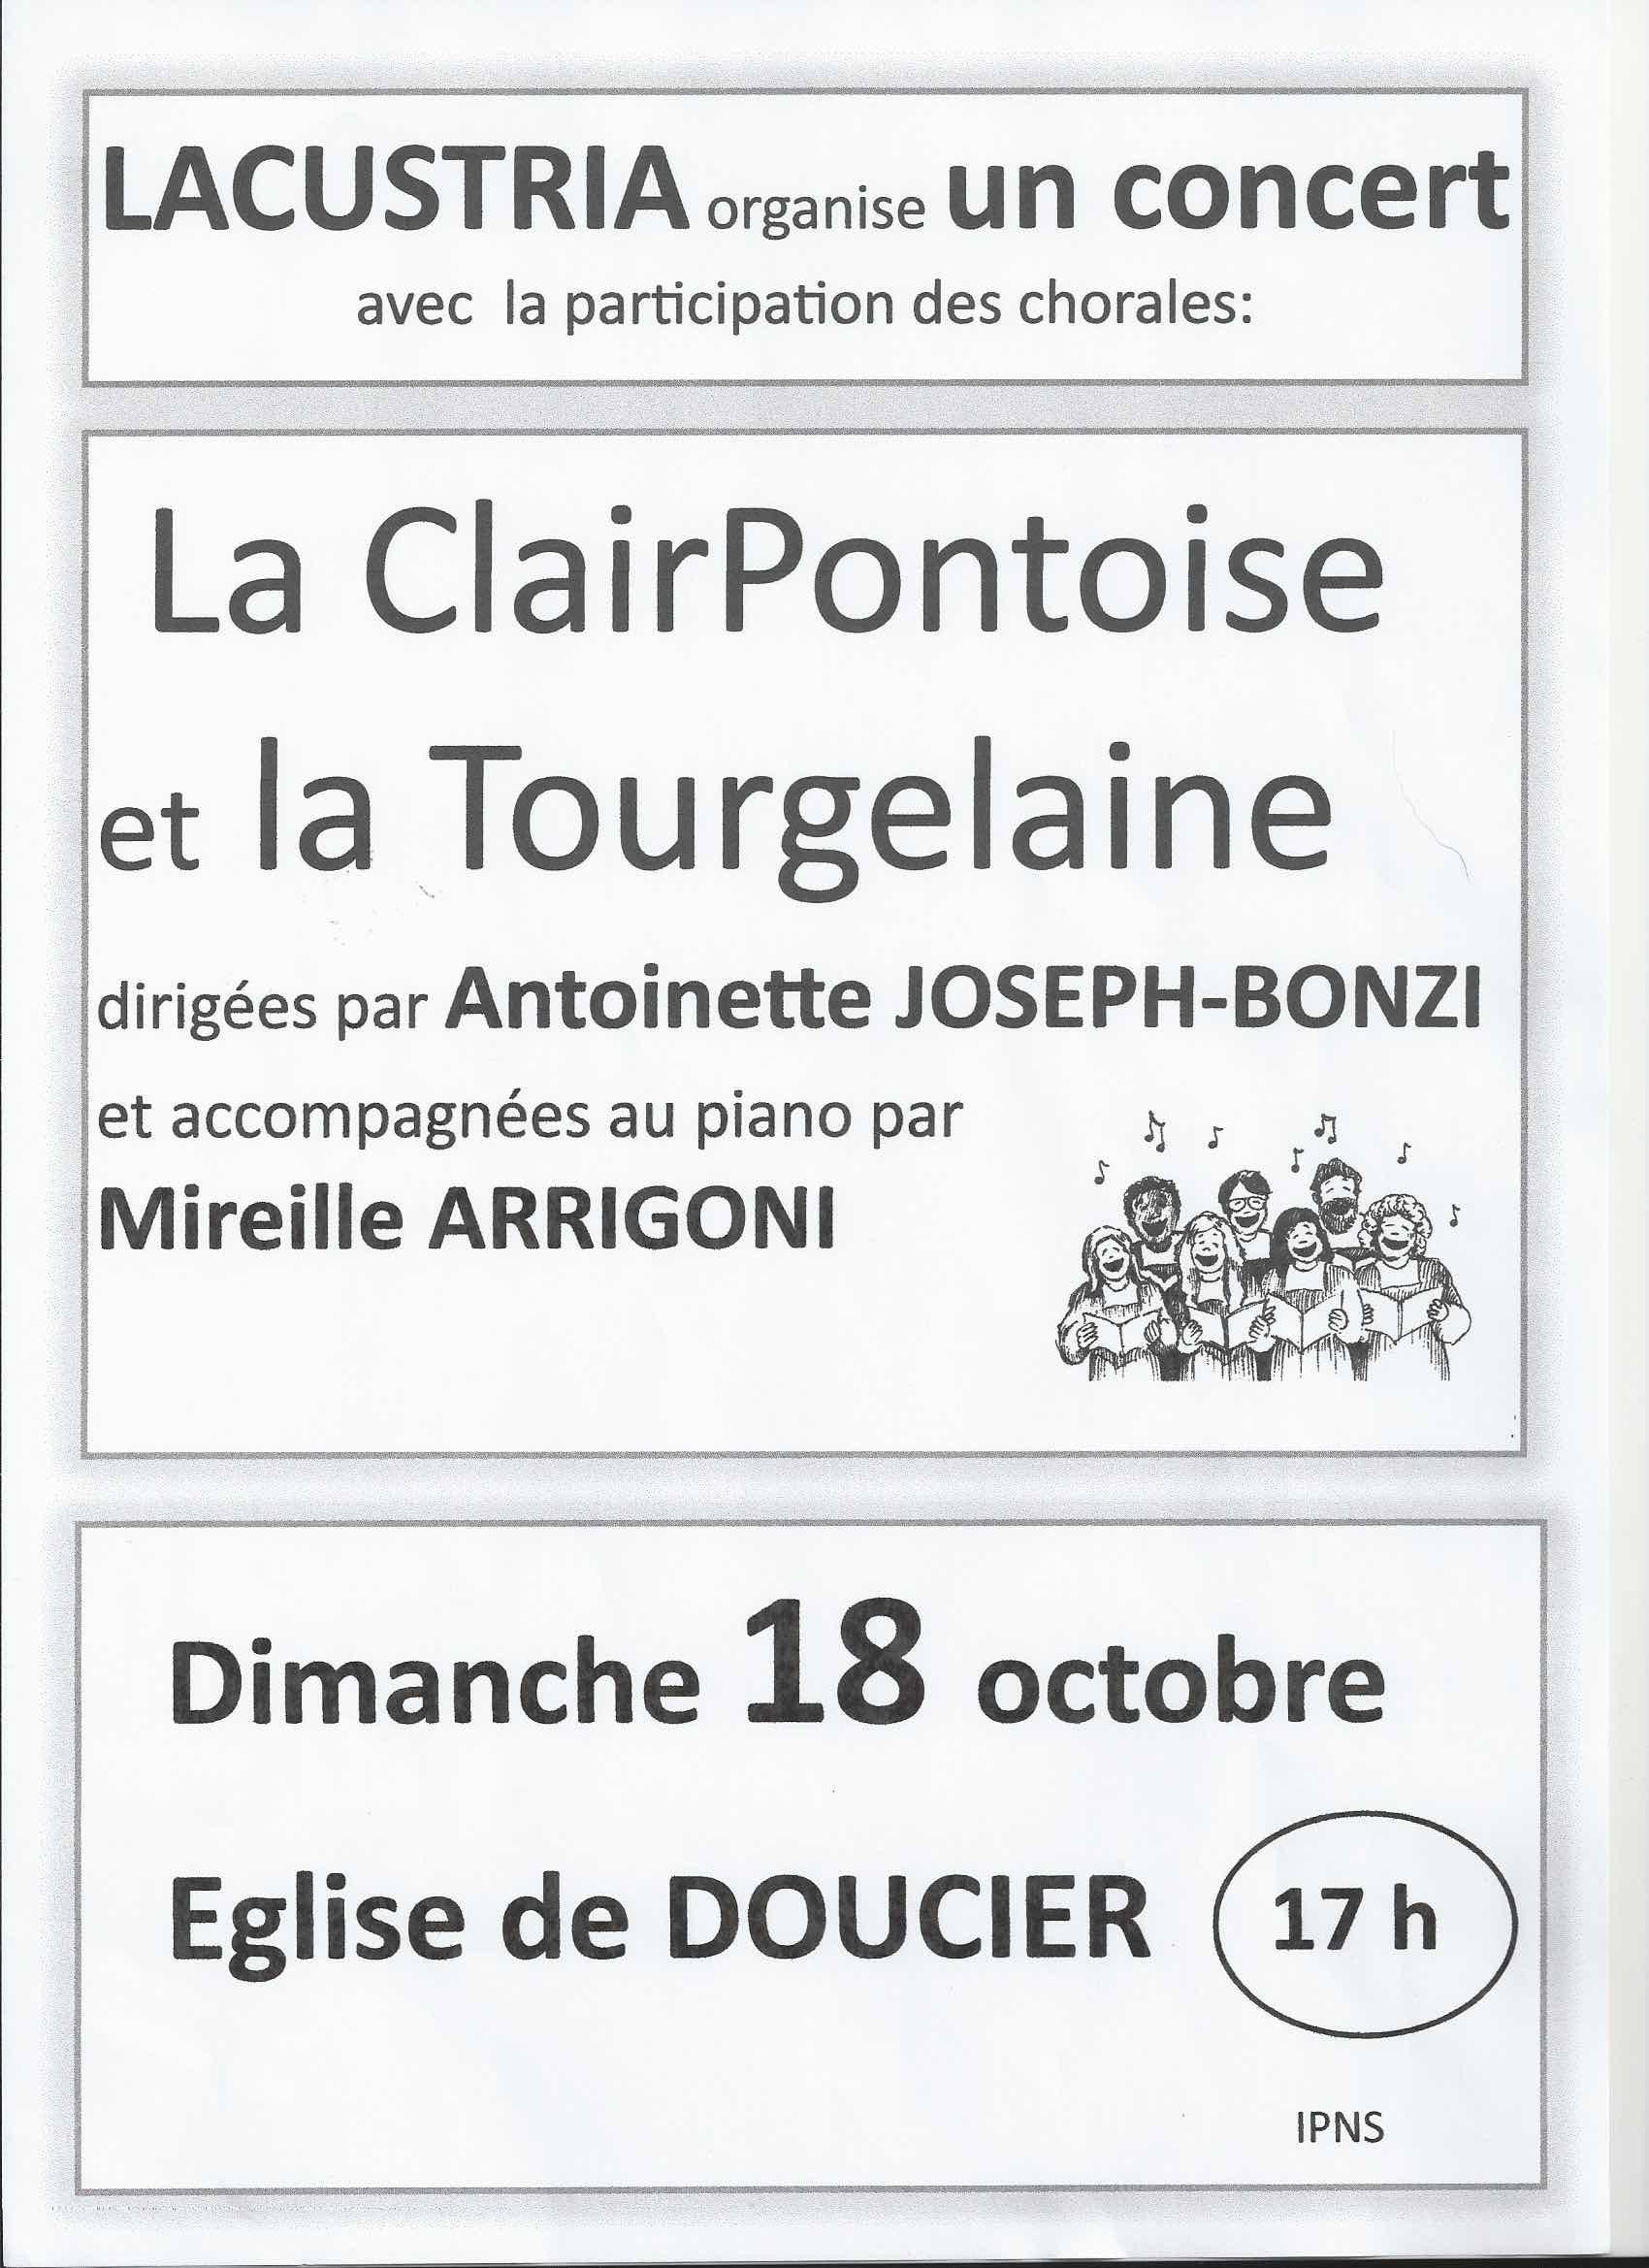 chorale_doucier_lacustria